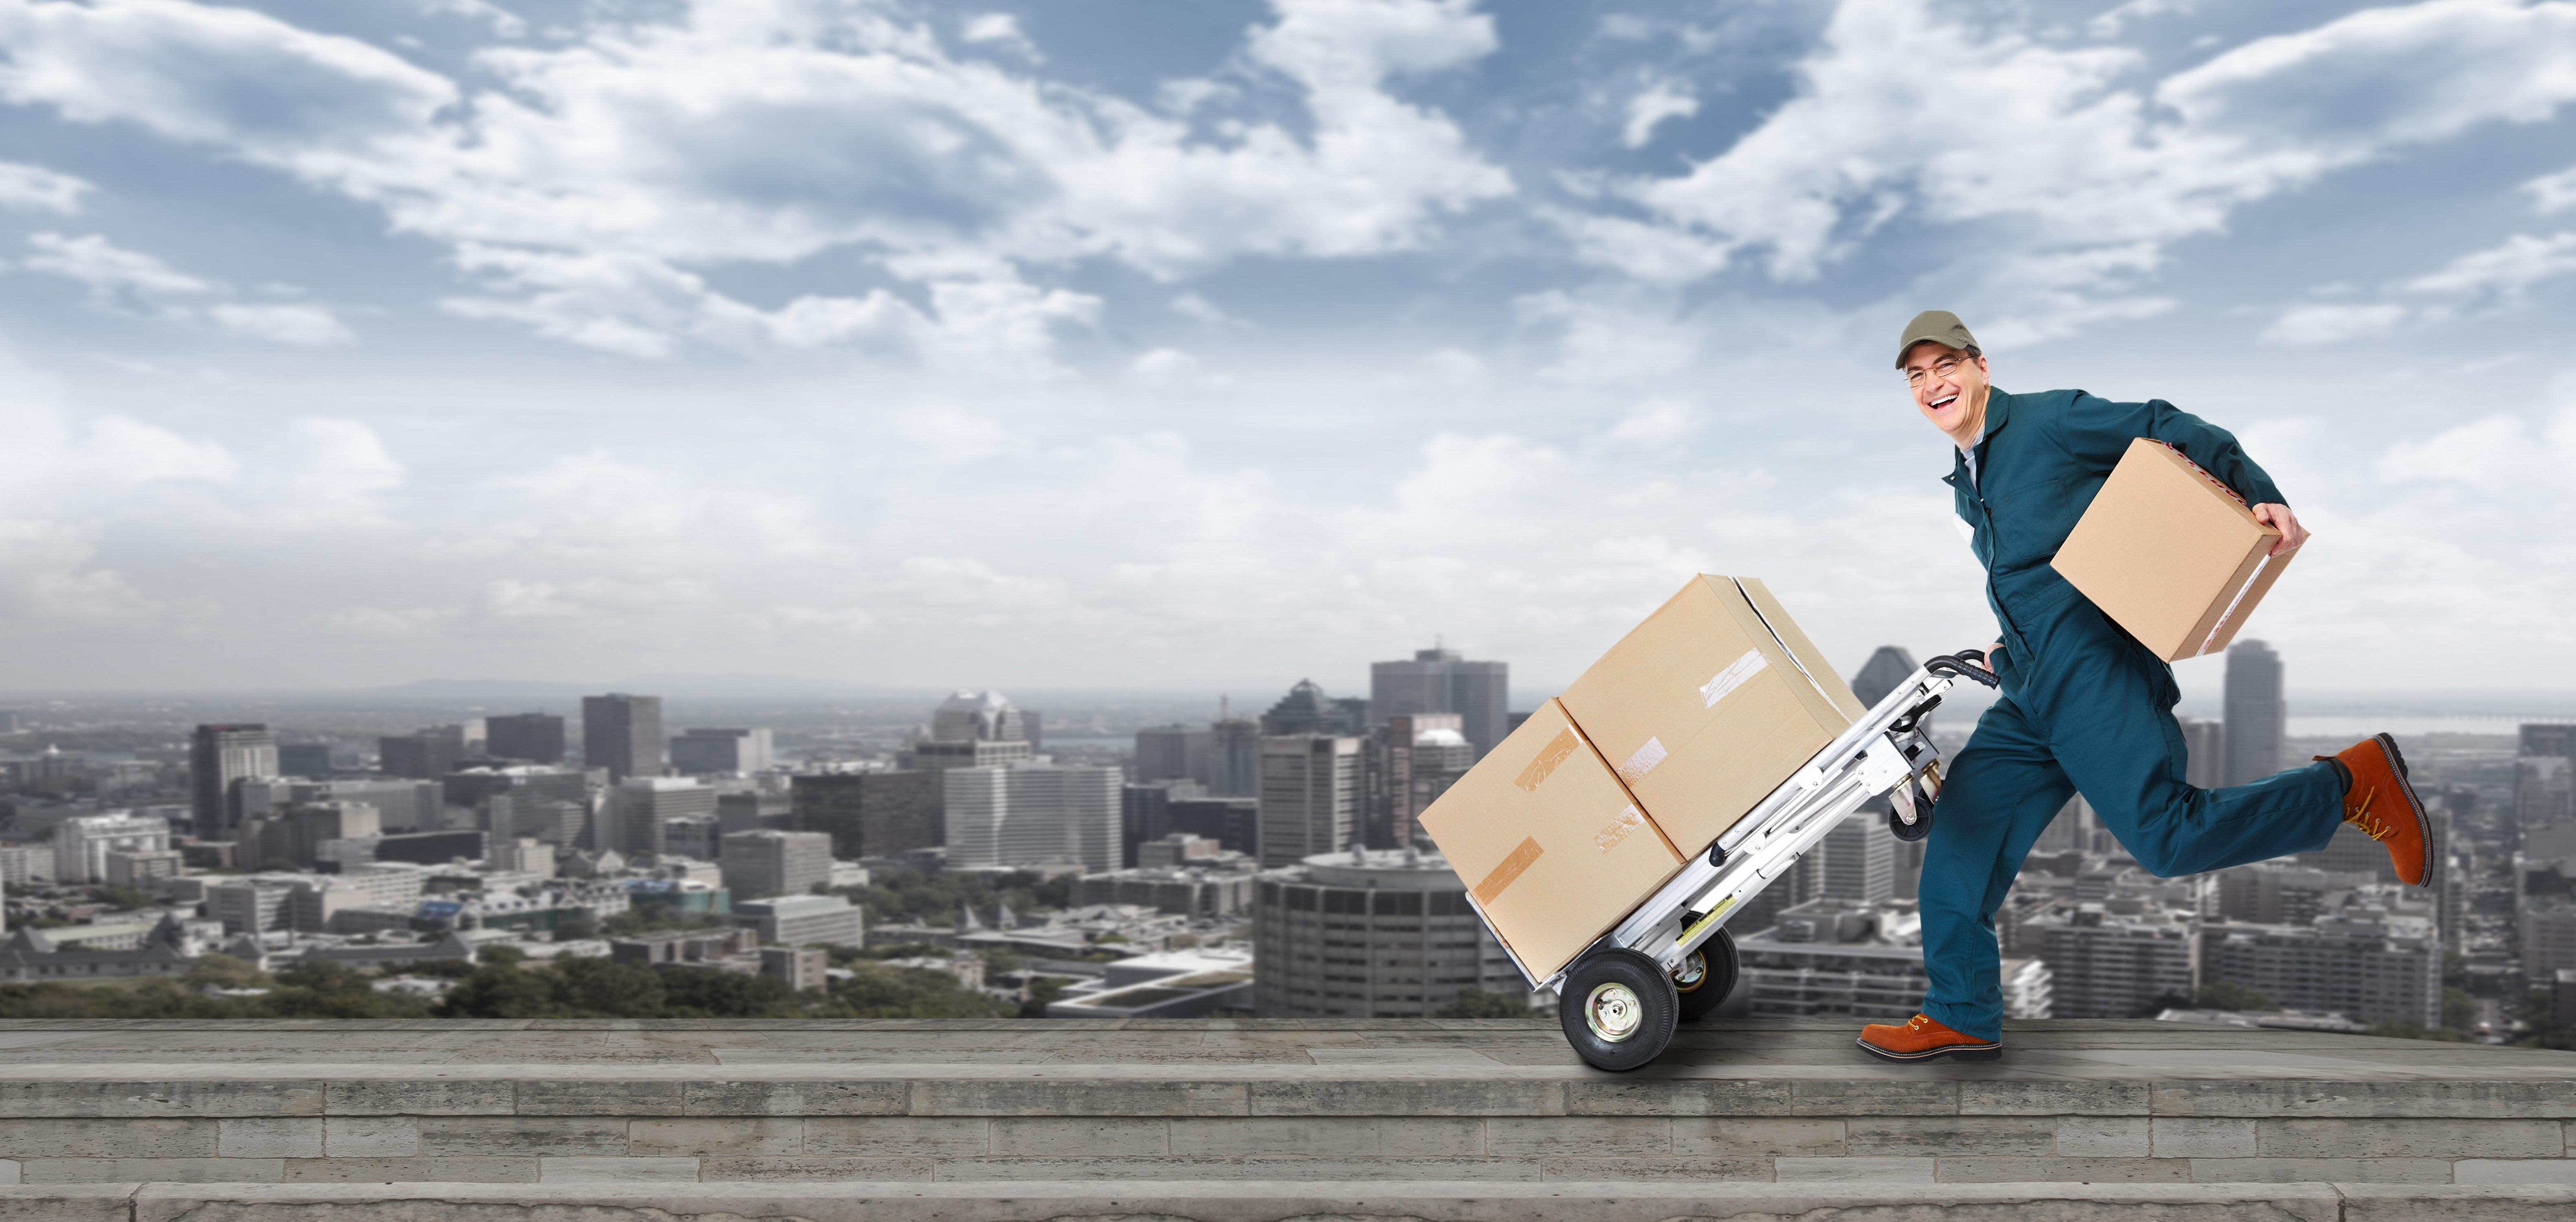 bigstock-Running-Delivery-postman-Ship-47134528.jpg